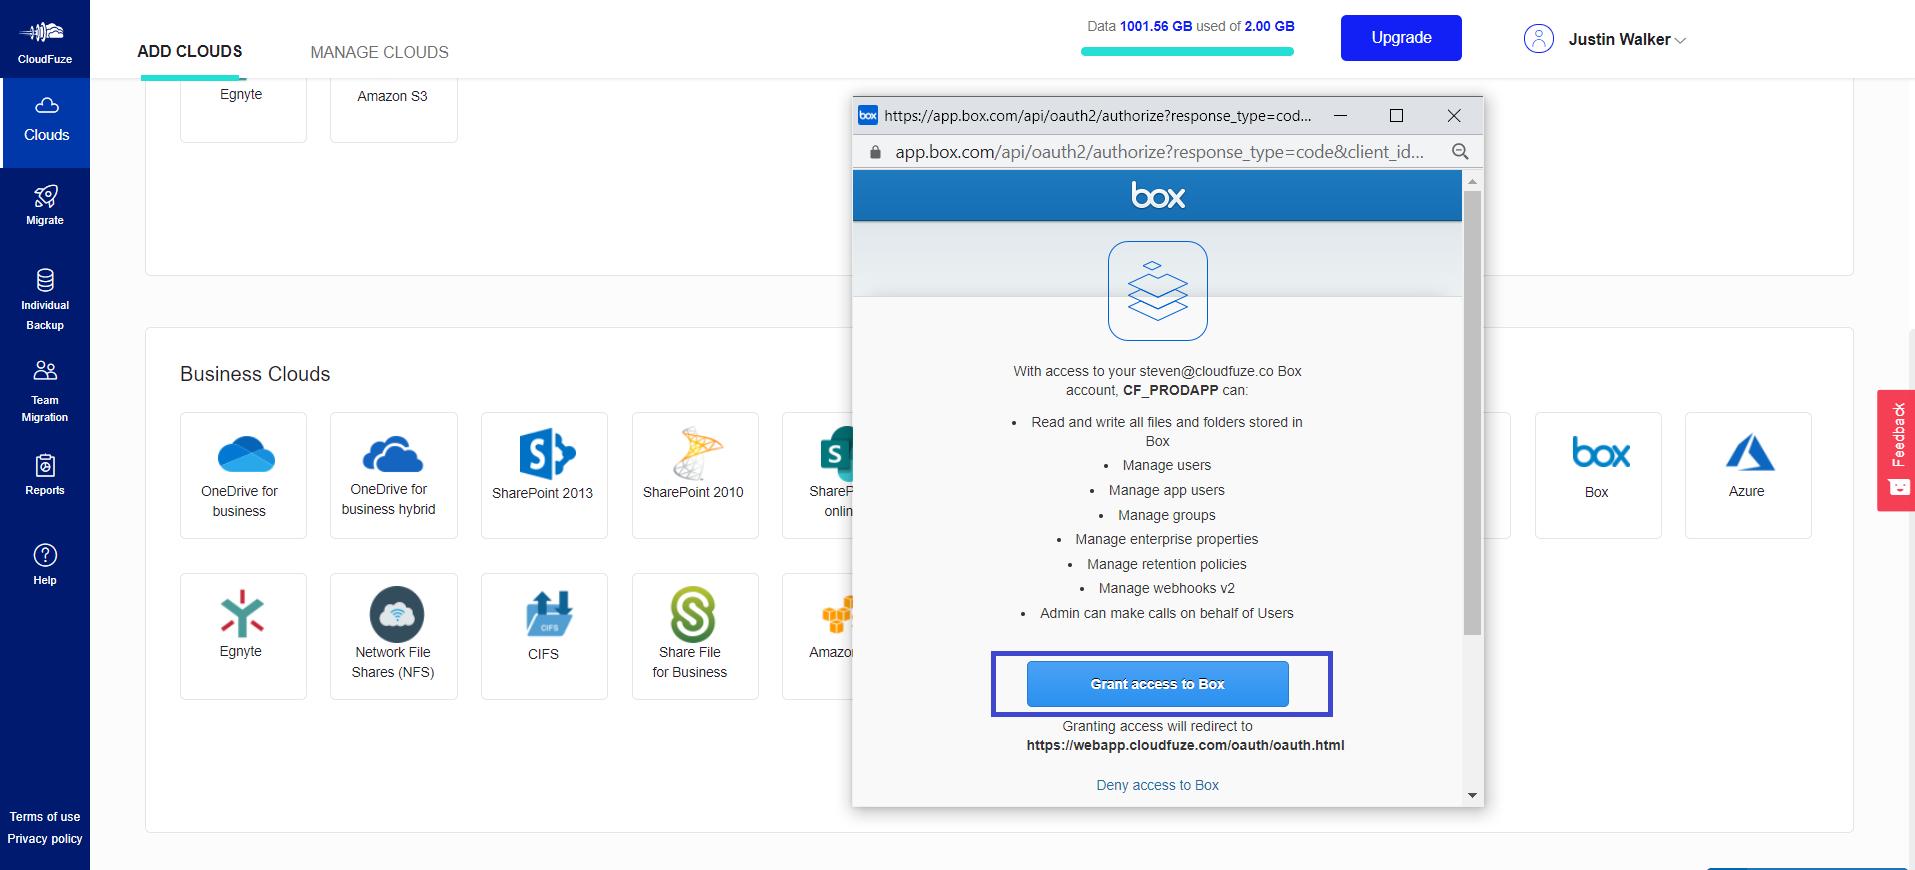 Provide access to Box account